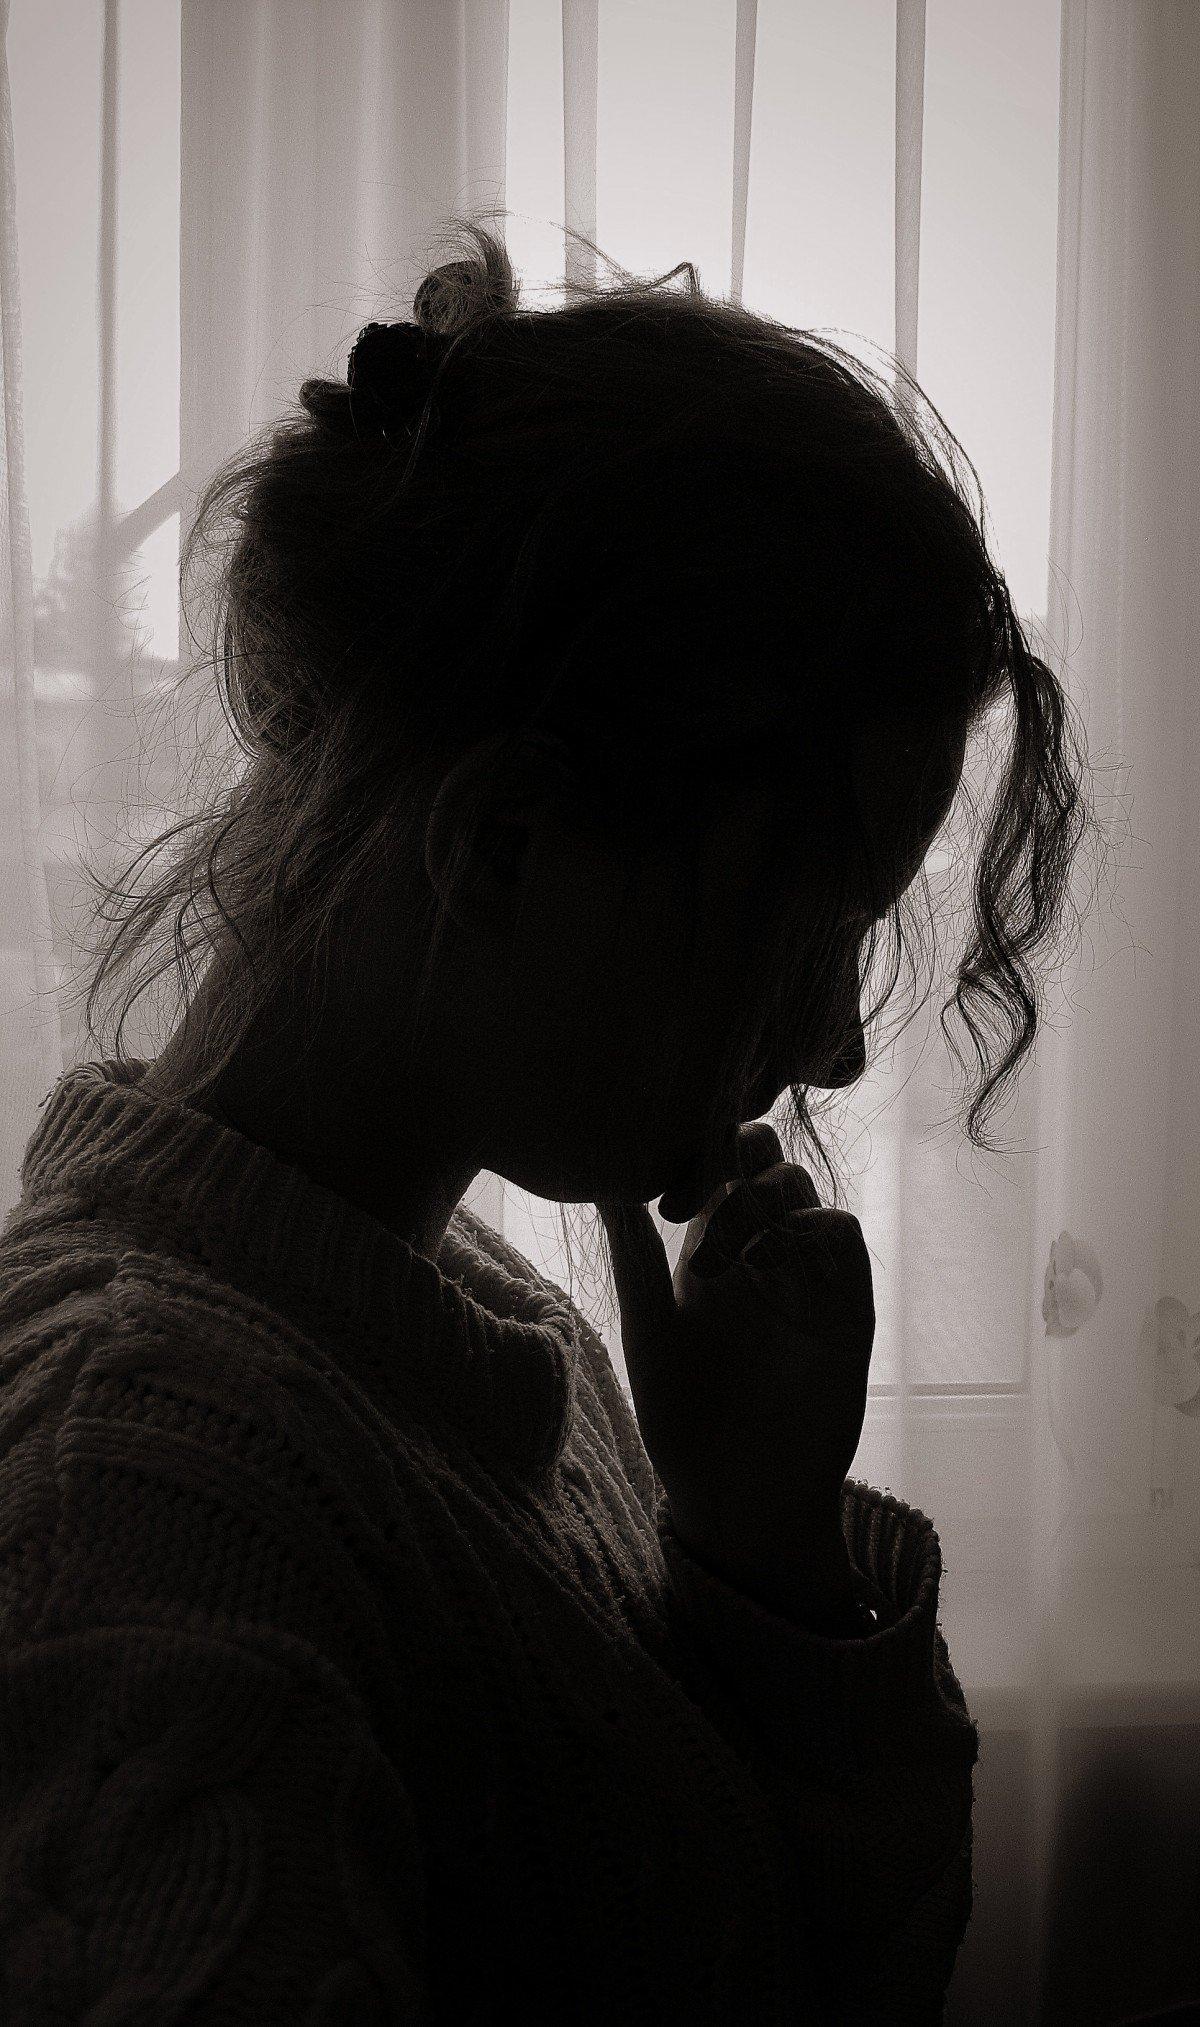 Silueta de mujer pensativa. | Imagen: PxHere